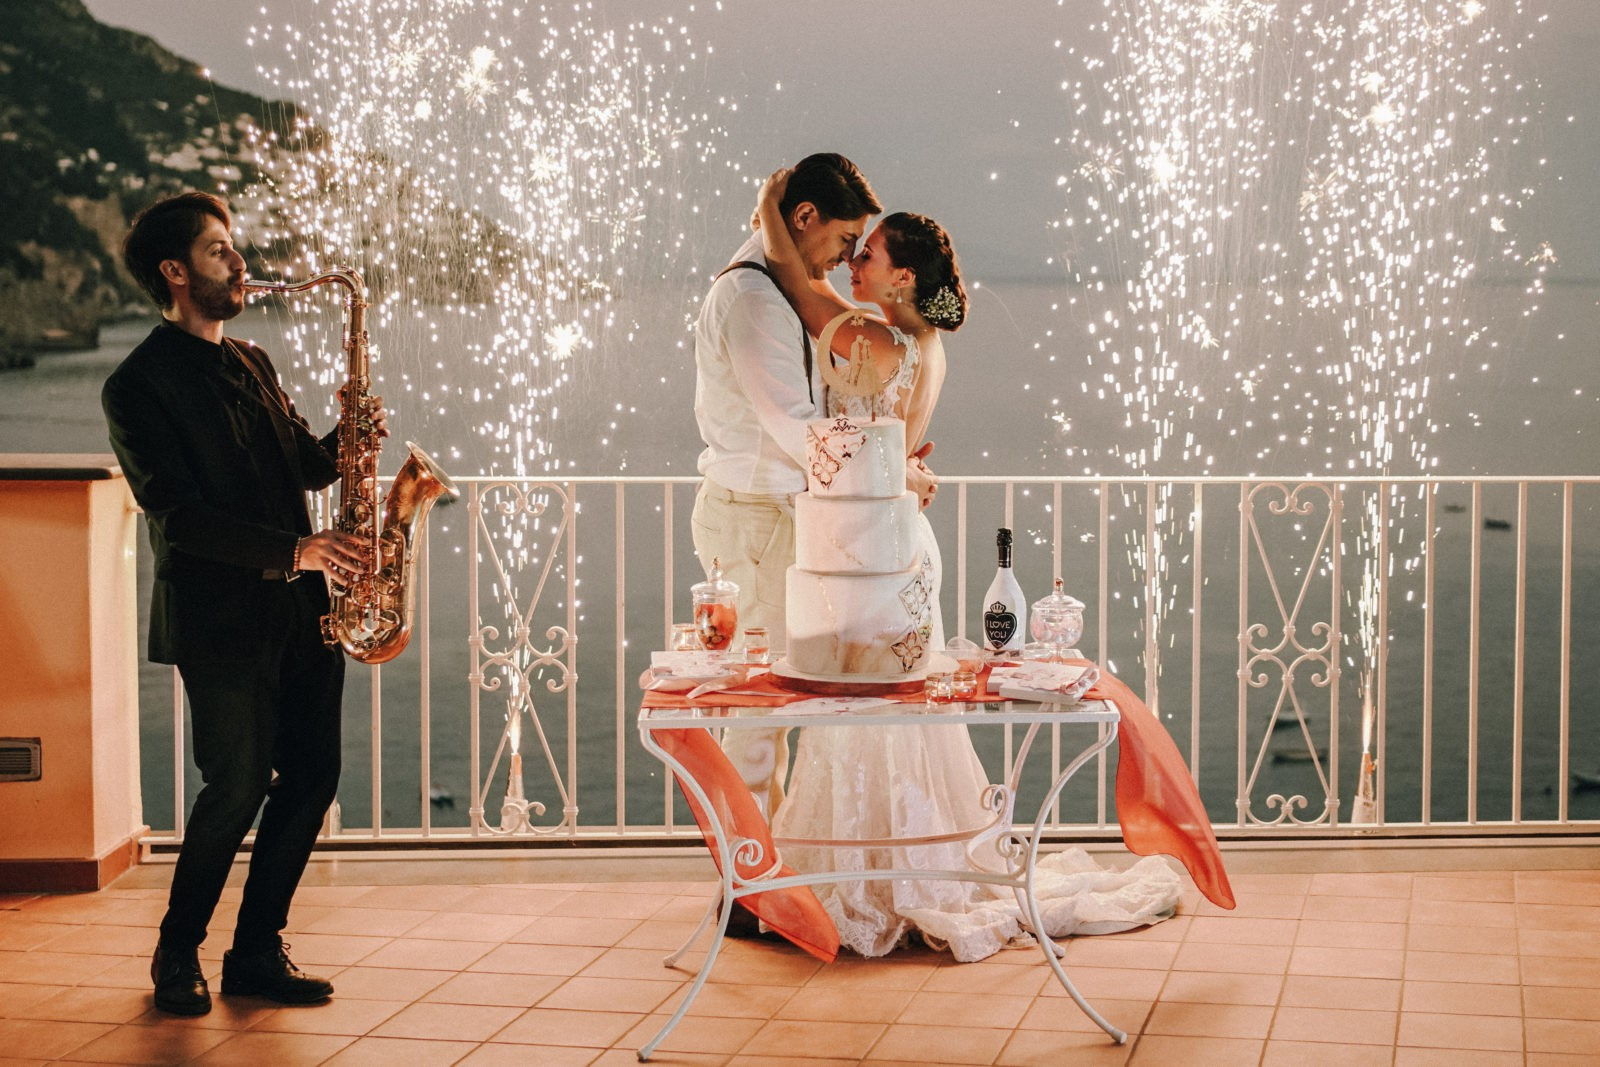 Intimate Wedding: il nuovo trend dei matrimoni 2021, Intimate wedding, Positano: lo shooting di SposIn Campania, shooting positano, positano, sposincampania, shooting sposincampania, wedding campania, wedding, costiera amalfitana, wedding costiera amalfitana